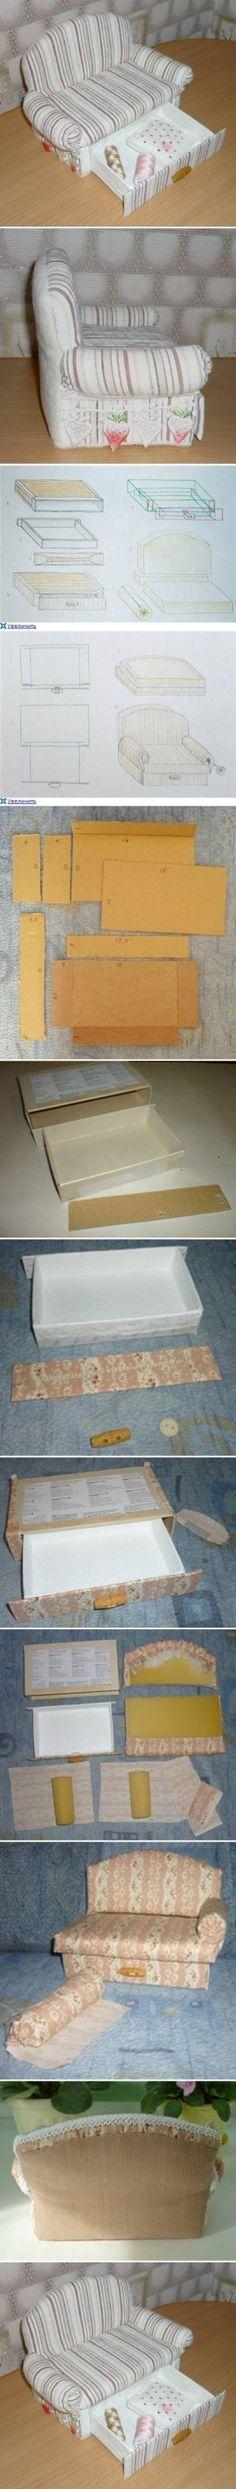 How to make Cardboard Sofa with Drawer storage unit step by step DIY tutorial instructions, How to, how to do, diy instructions, crafts, do by Mary Smith fSesz